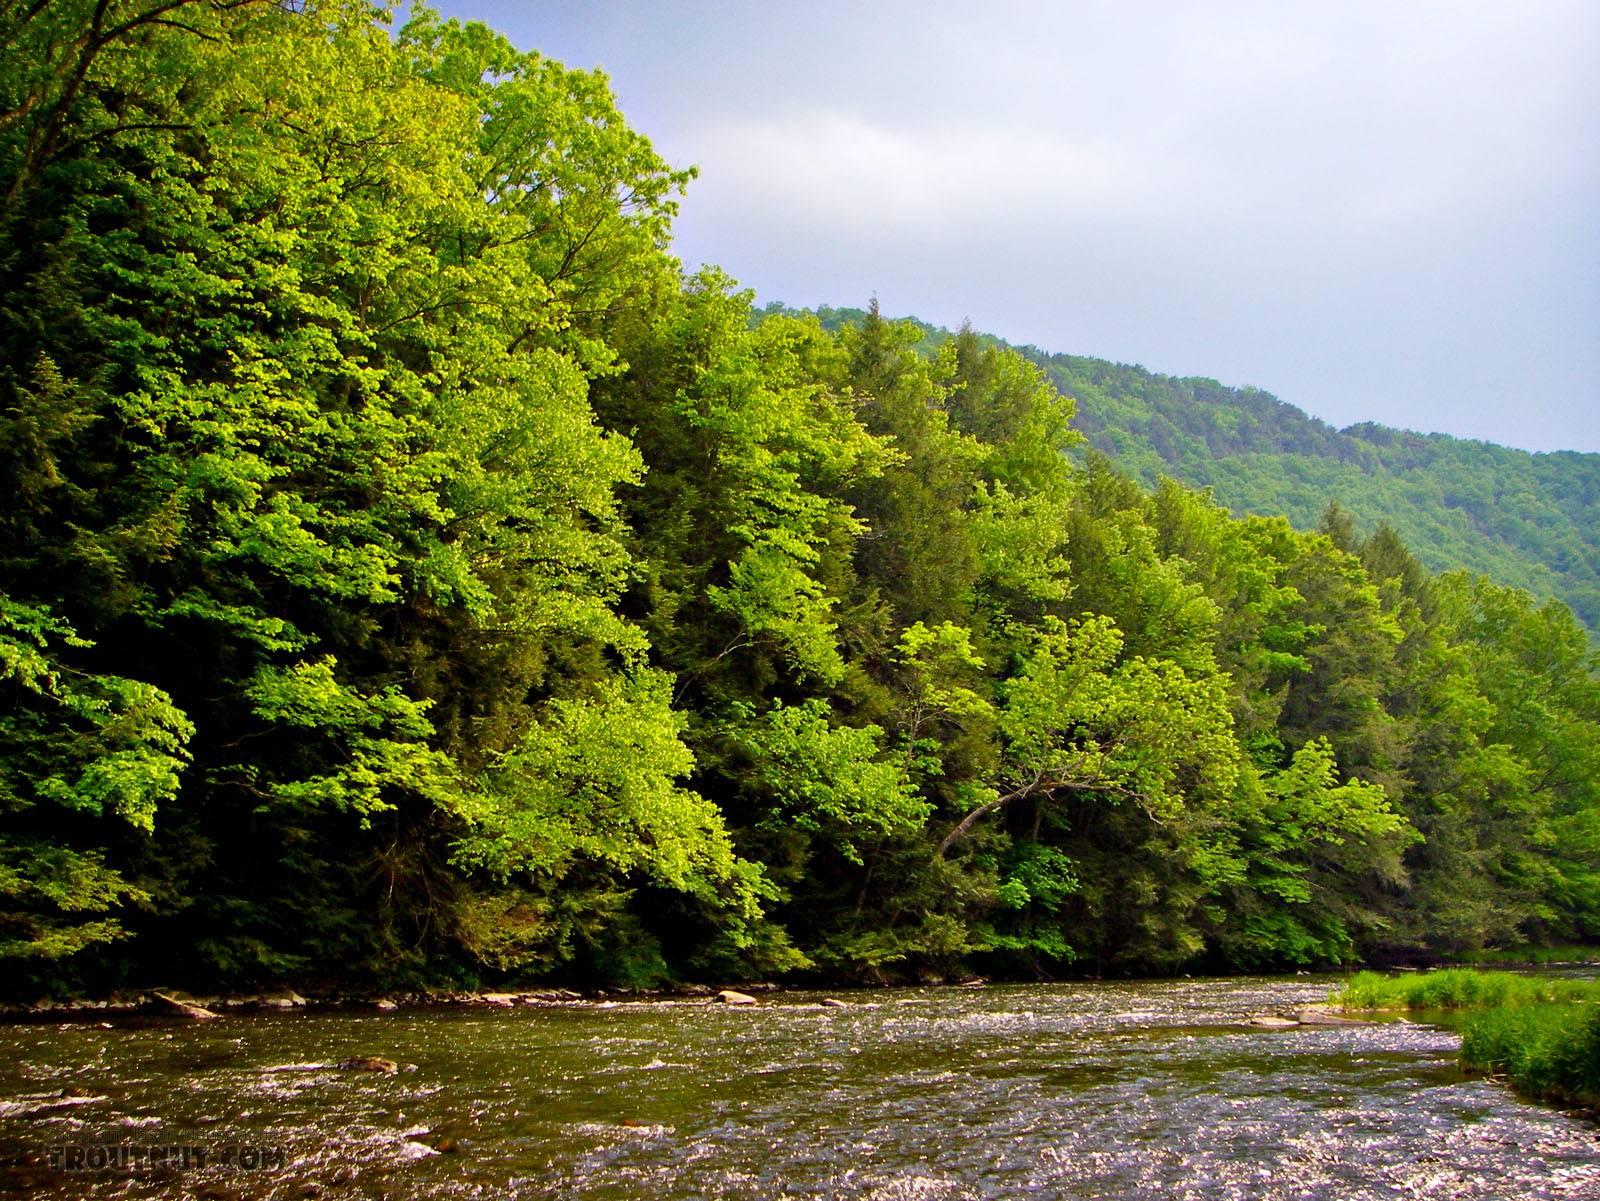 From Penn's Creek in Pennsylvania.